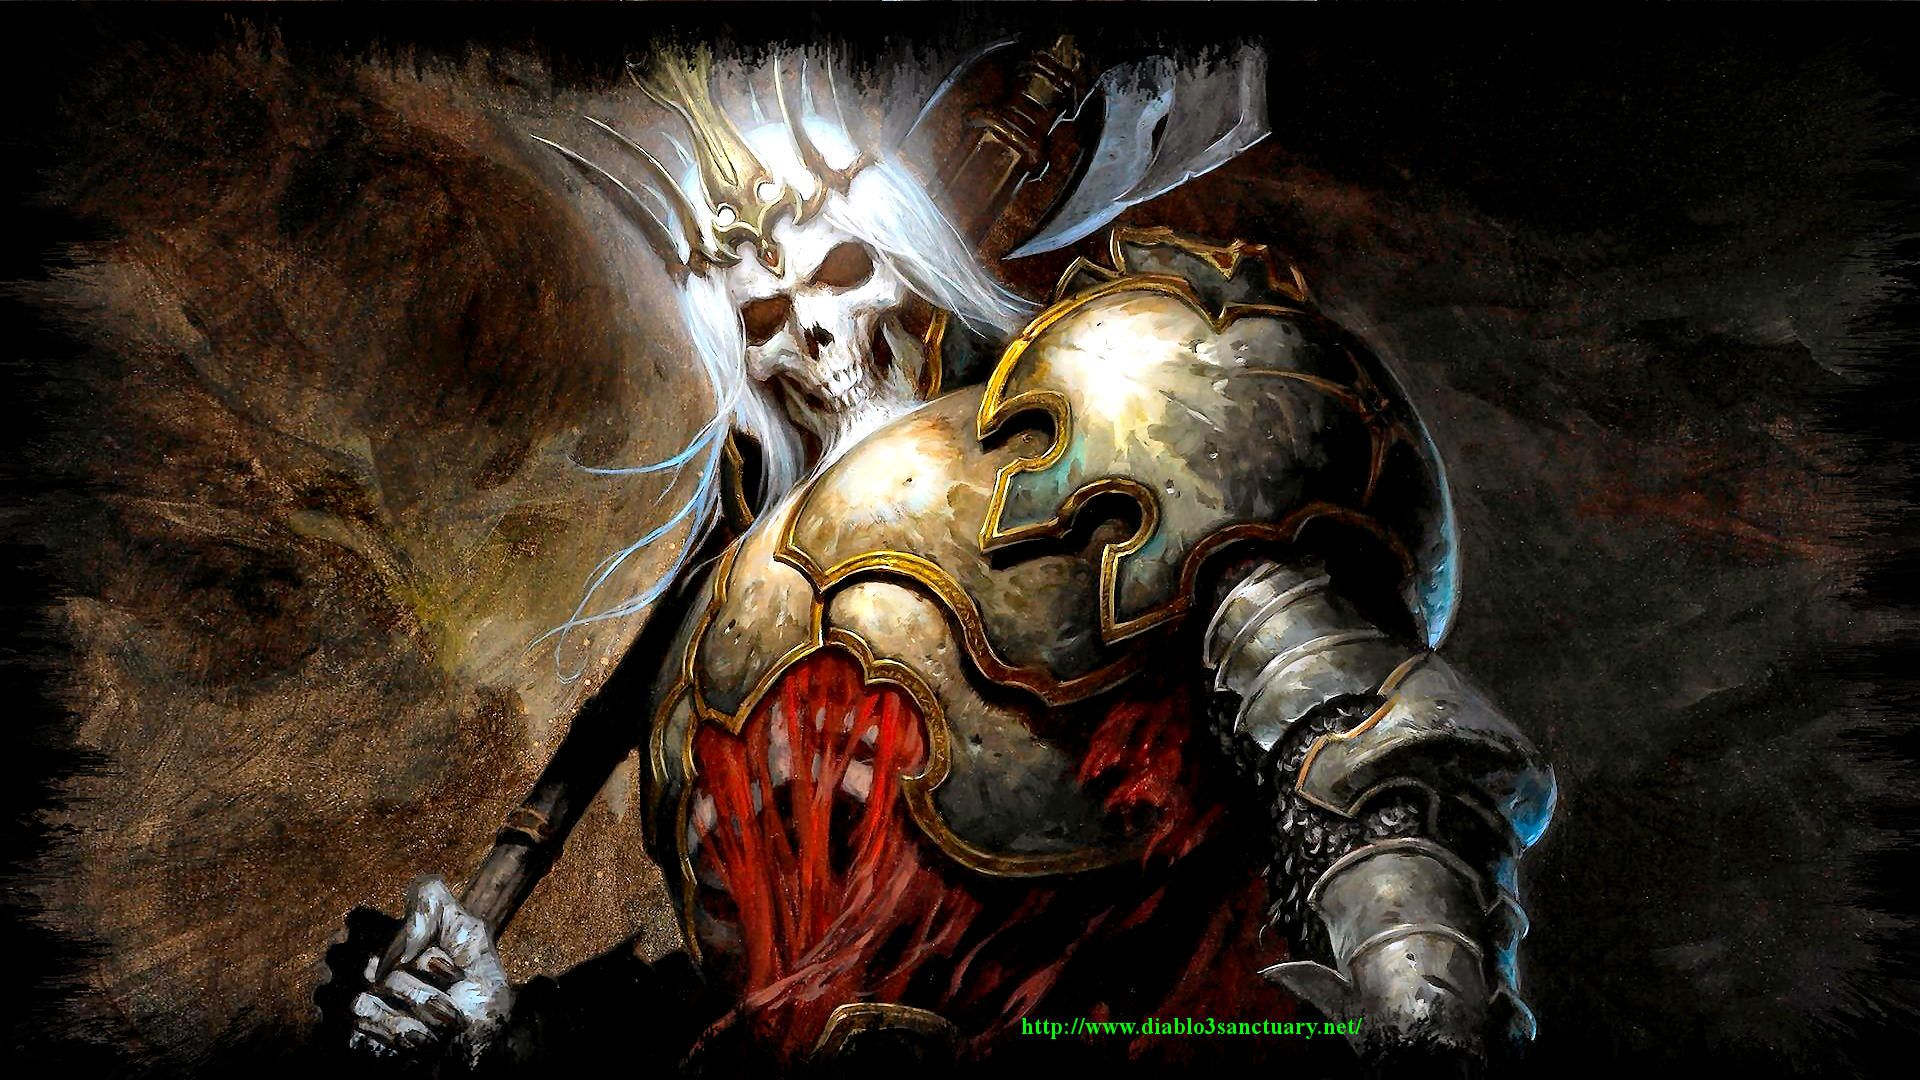 skeleton king diablo 3 wallpapers hd free 390640